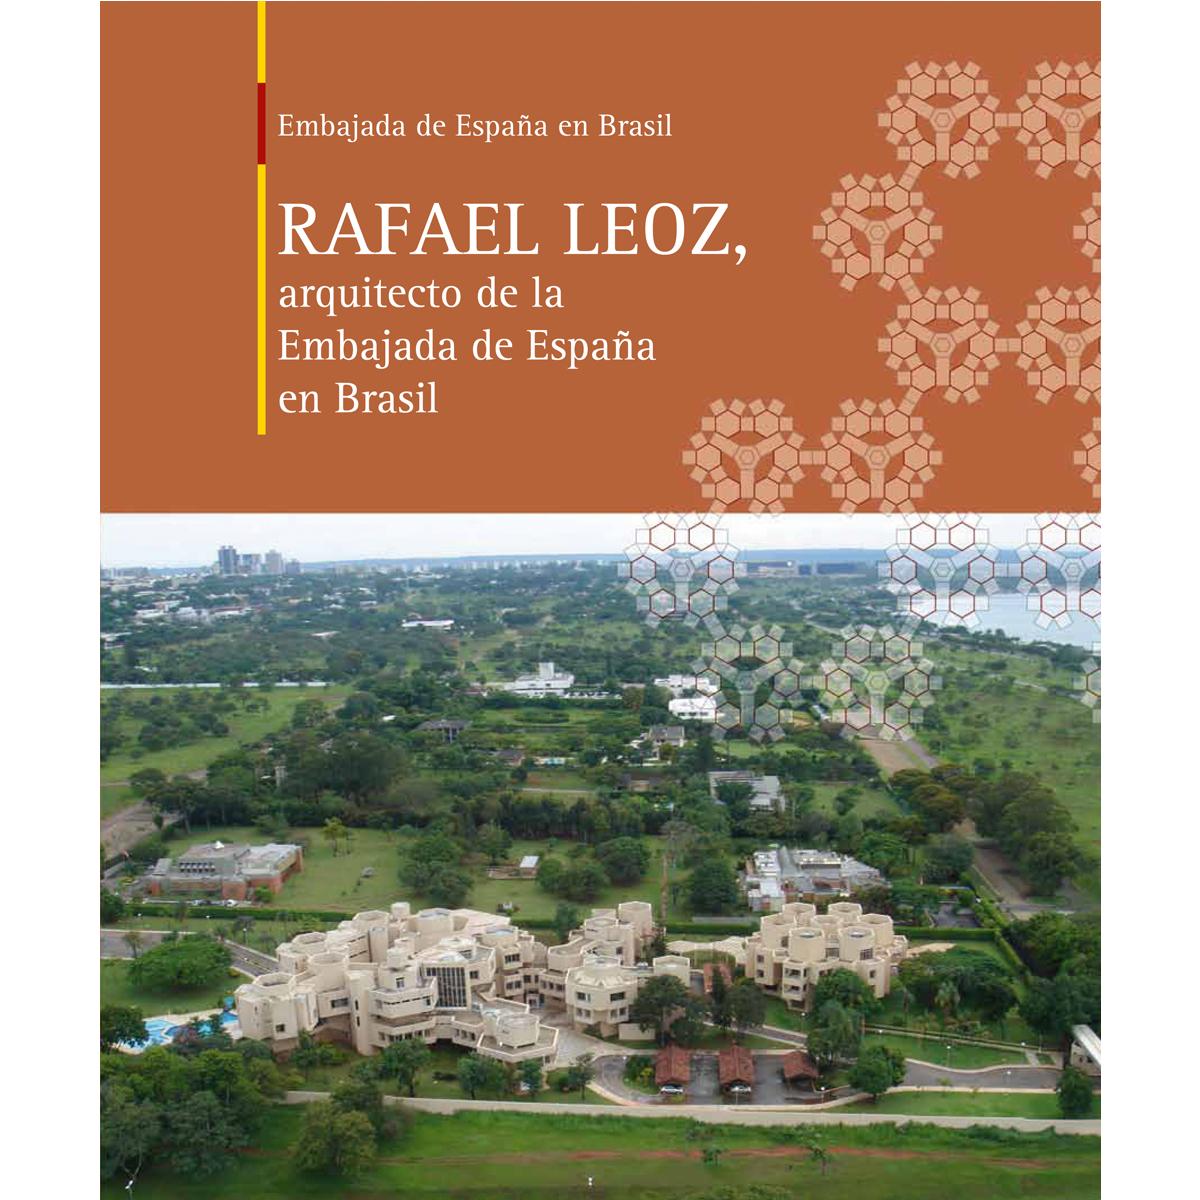 Rafael Leoz